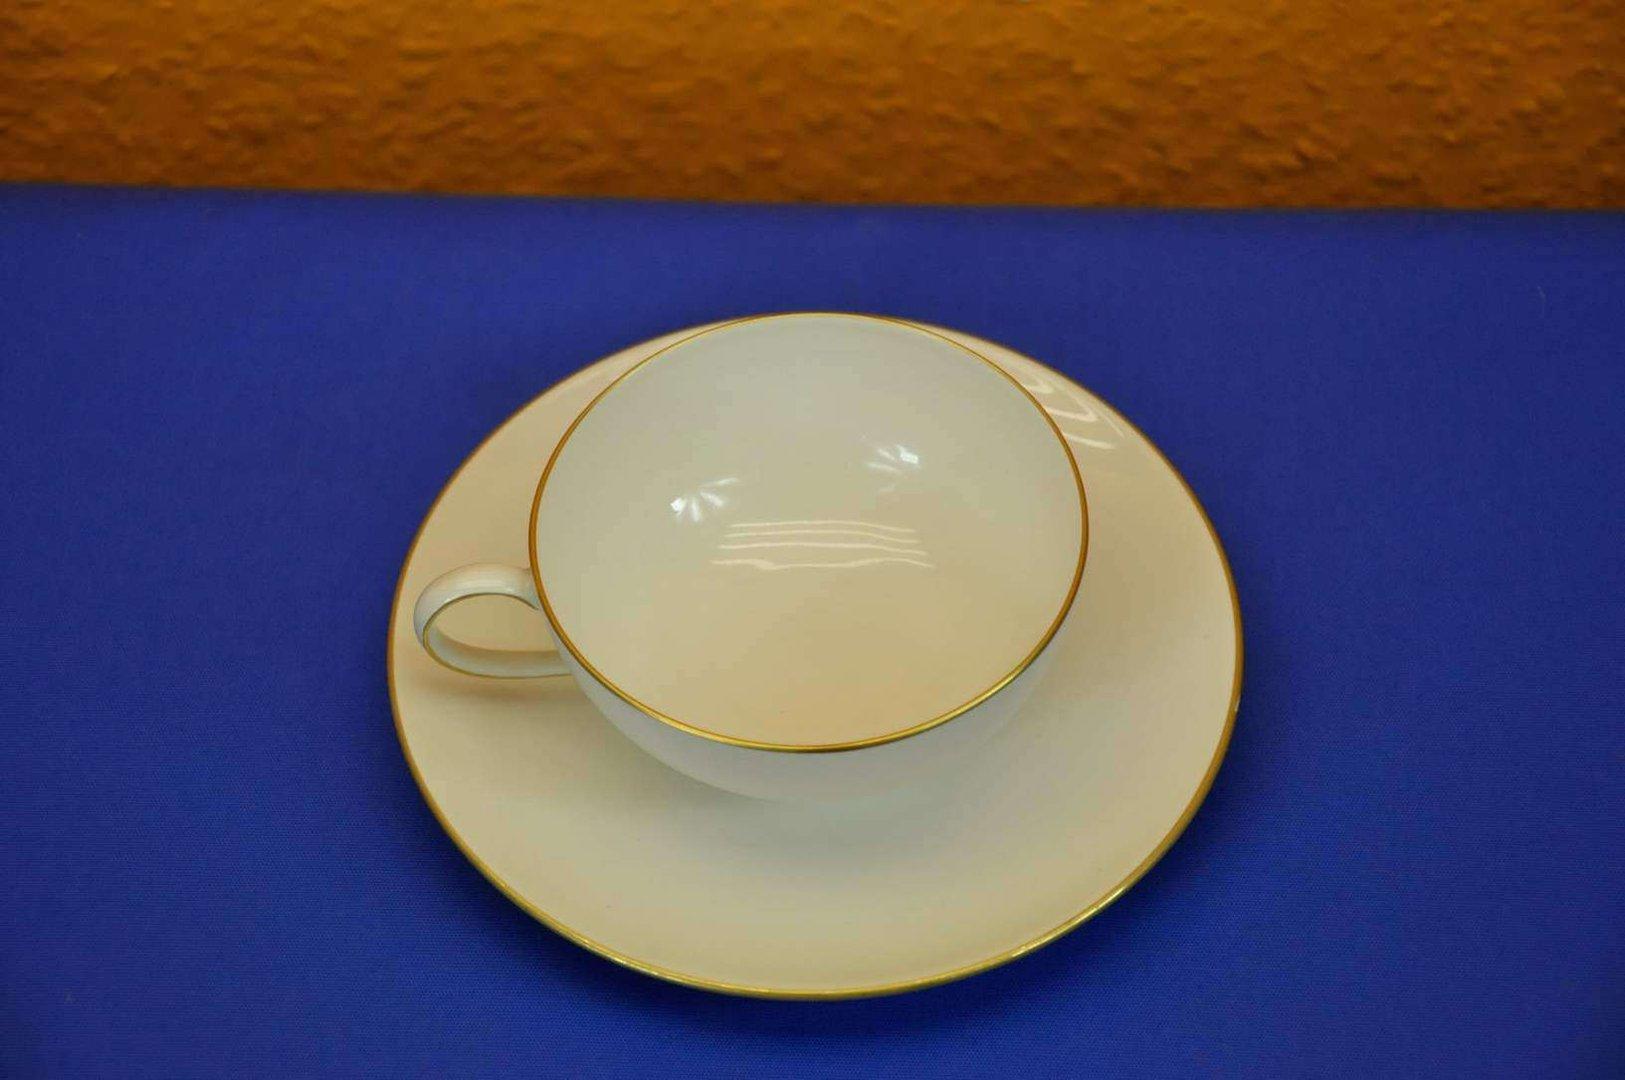 ... KPM Berlin tea cup Bauhaus Trude Petri cream gold edge ... & KPM Berlin tea cup Bauhaus Trude Petri cream gold edge - KuSeRa